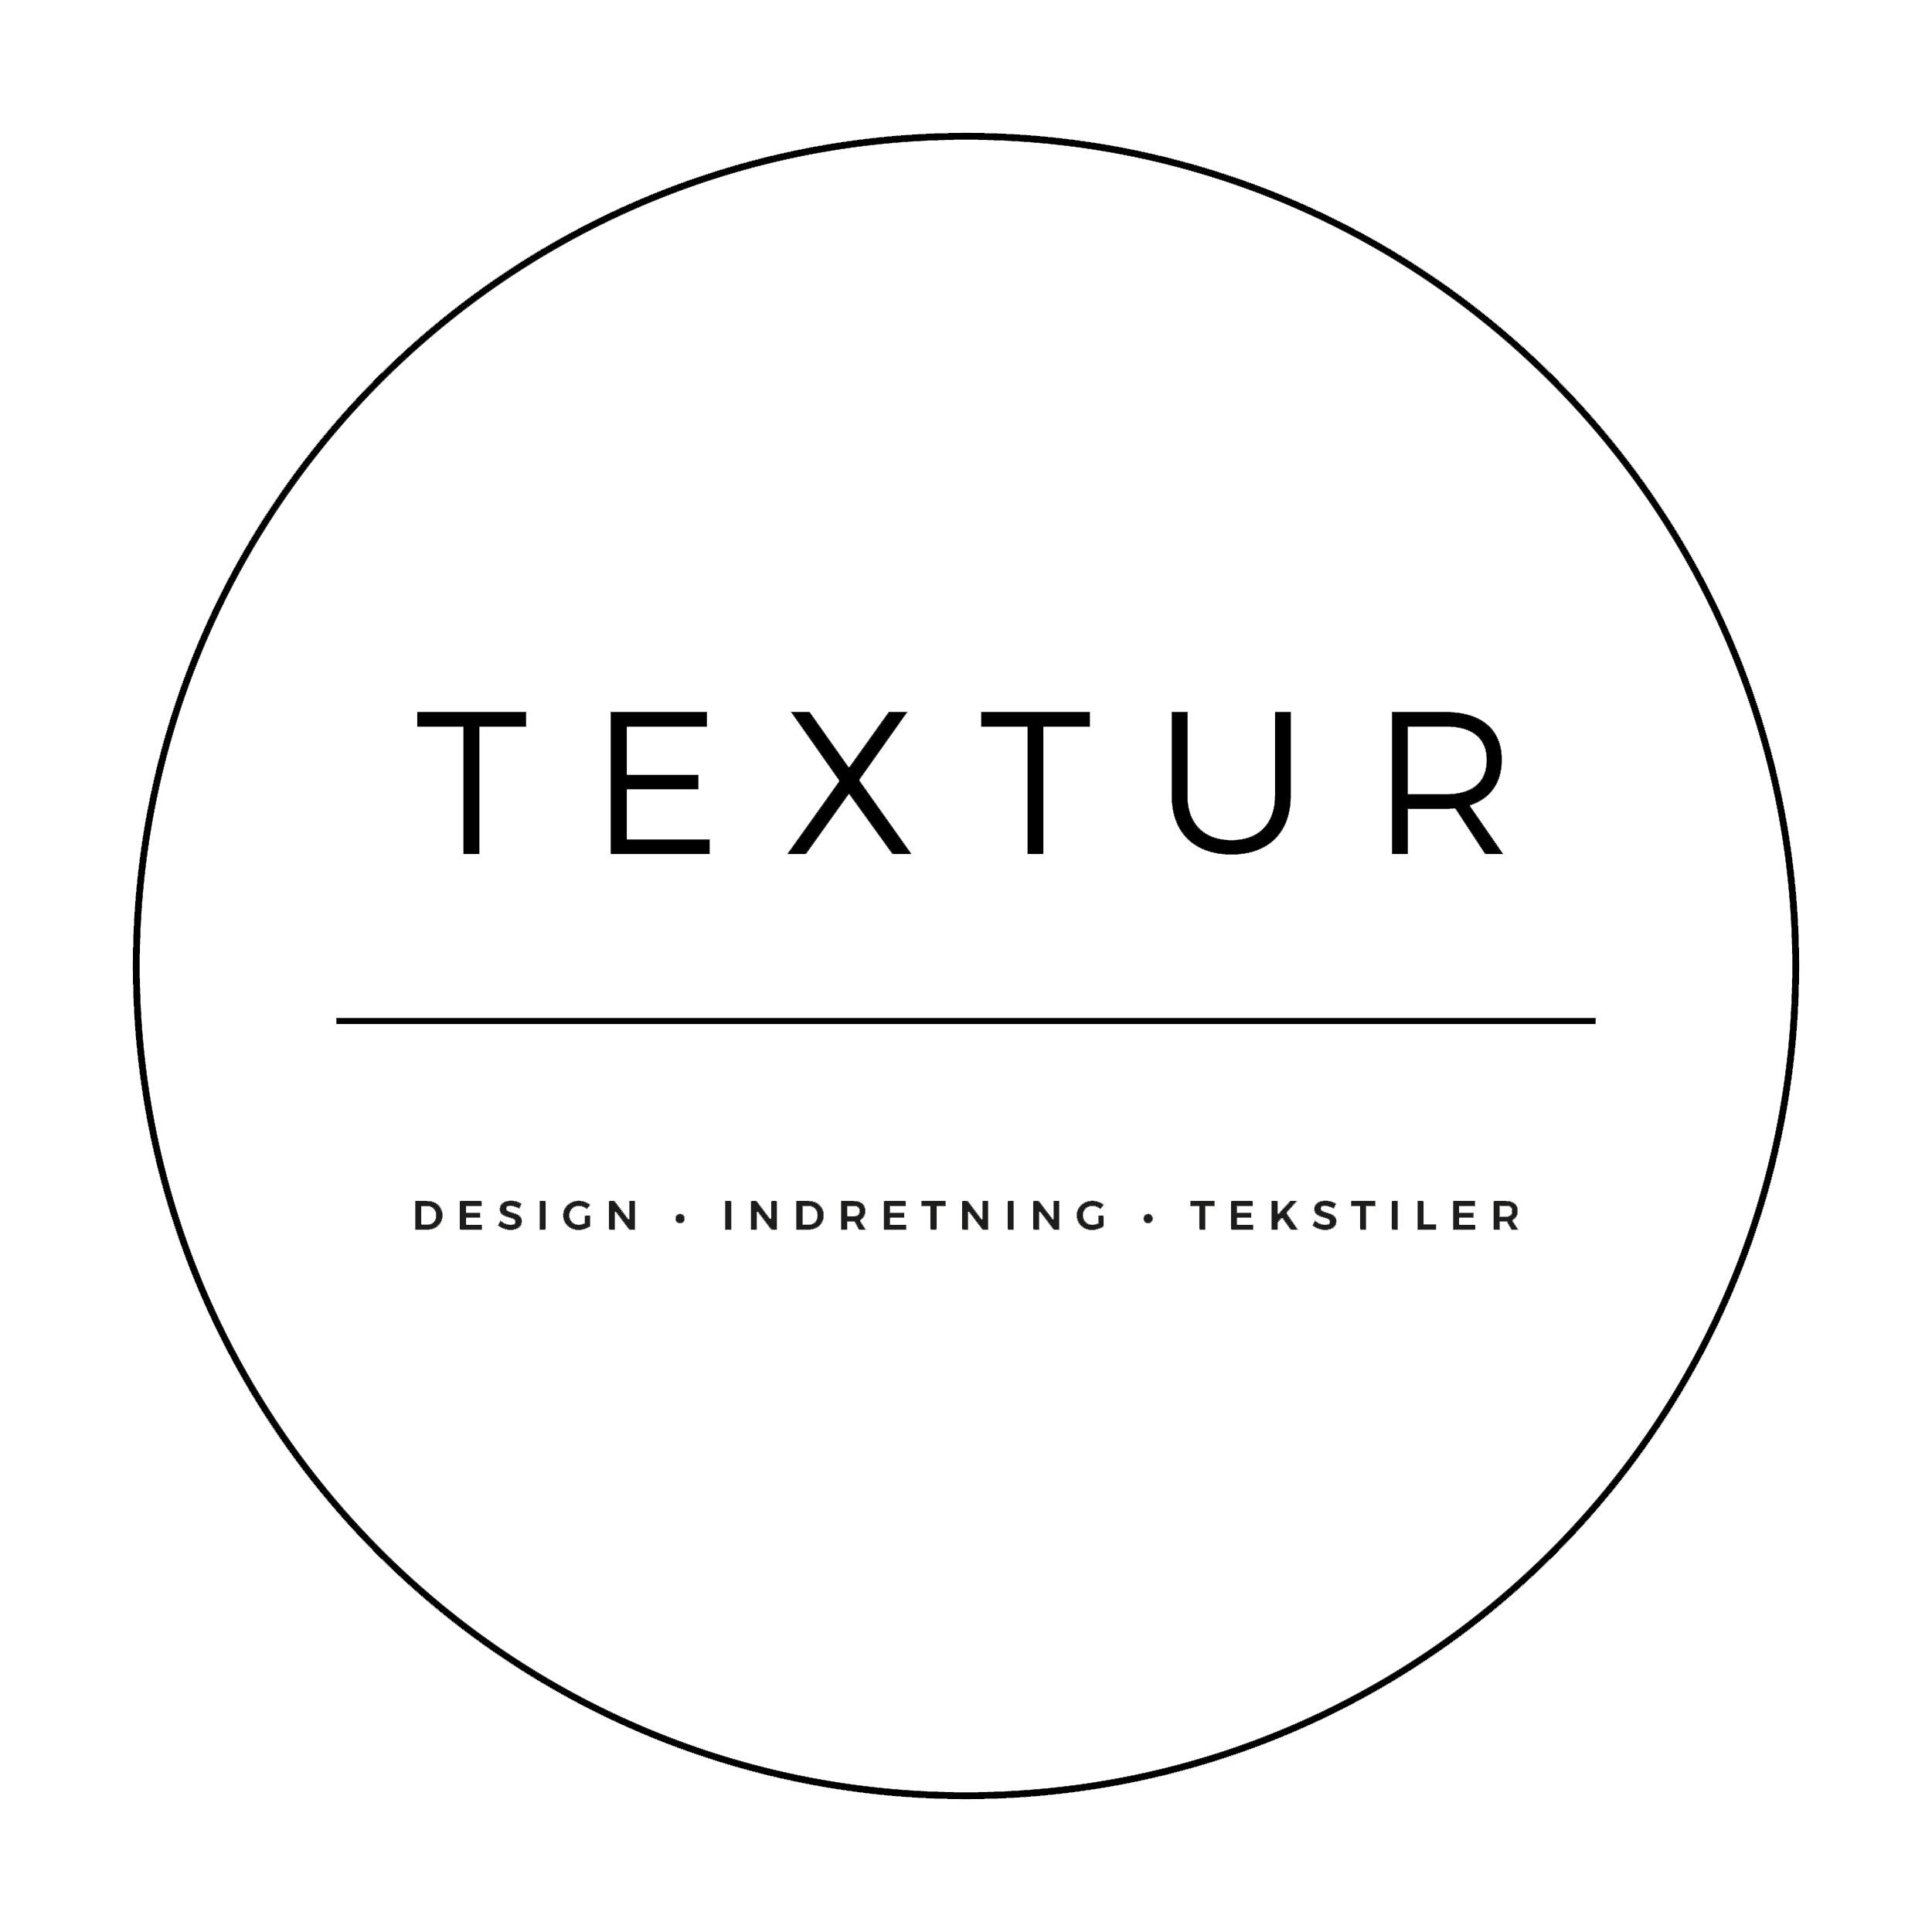 Textur